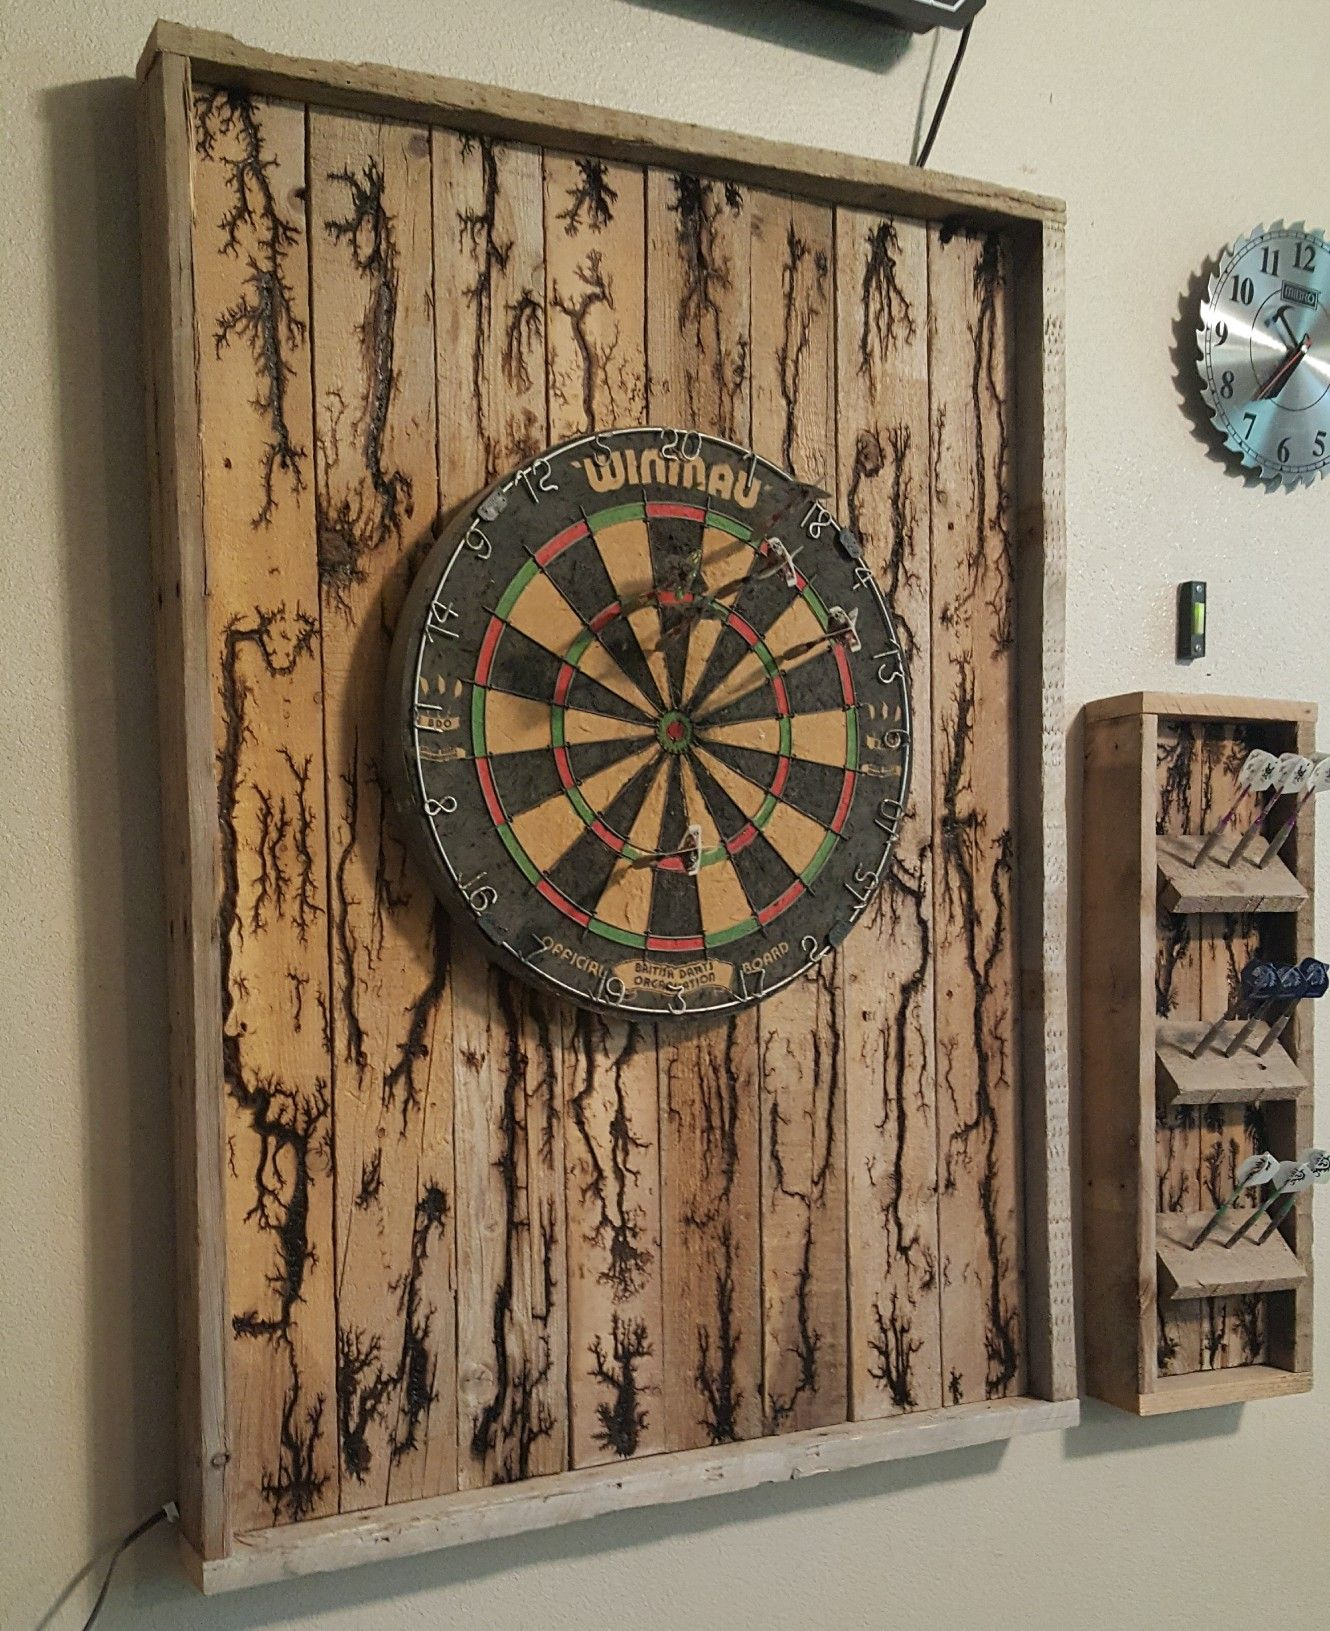 Pin by al nolan on Darts | Woodworking plans clocks ...